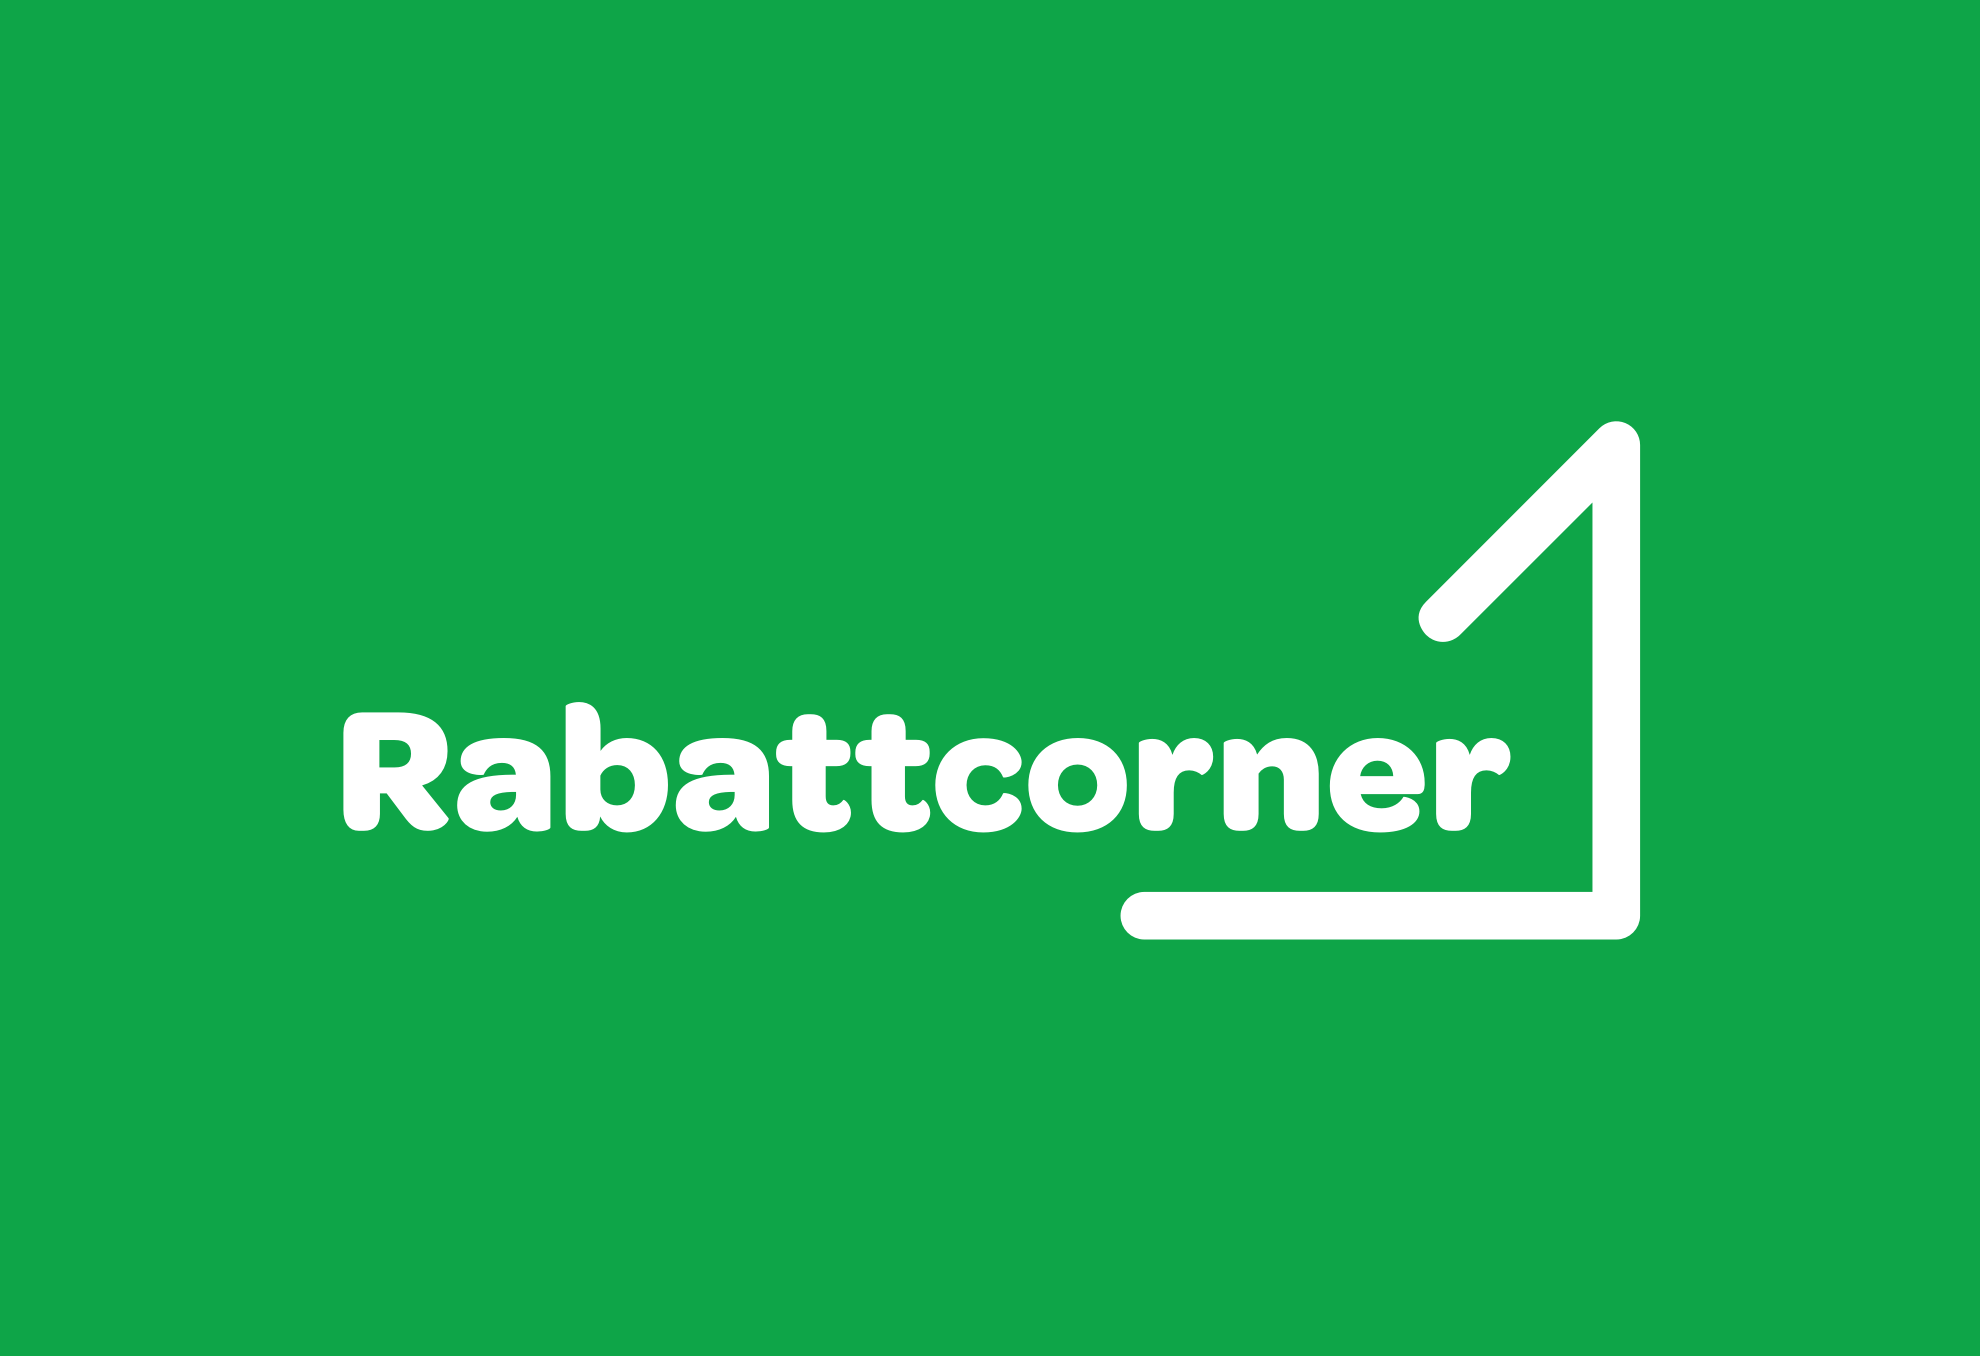 Rabattcorner.ch Identity